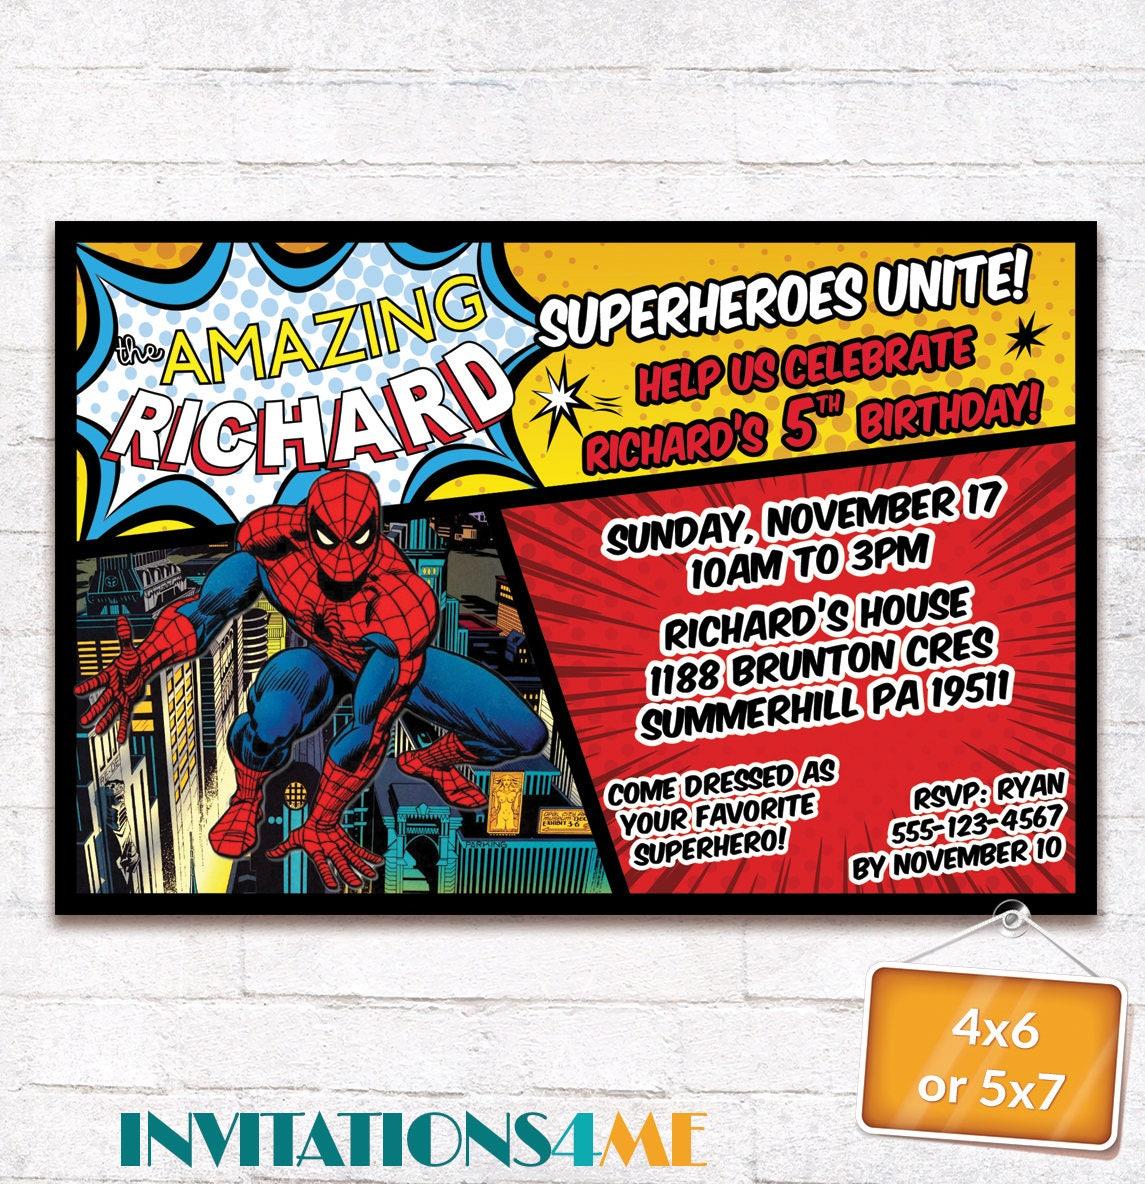 Spiderman Invitation The Amazing Spider-Man Superhero Birthday Party ...